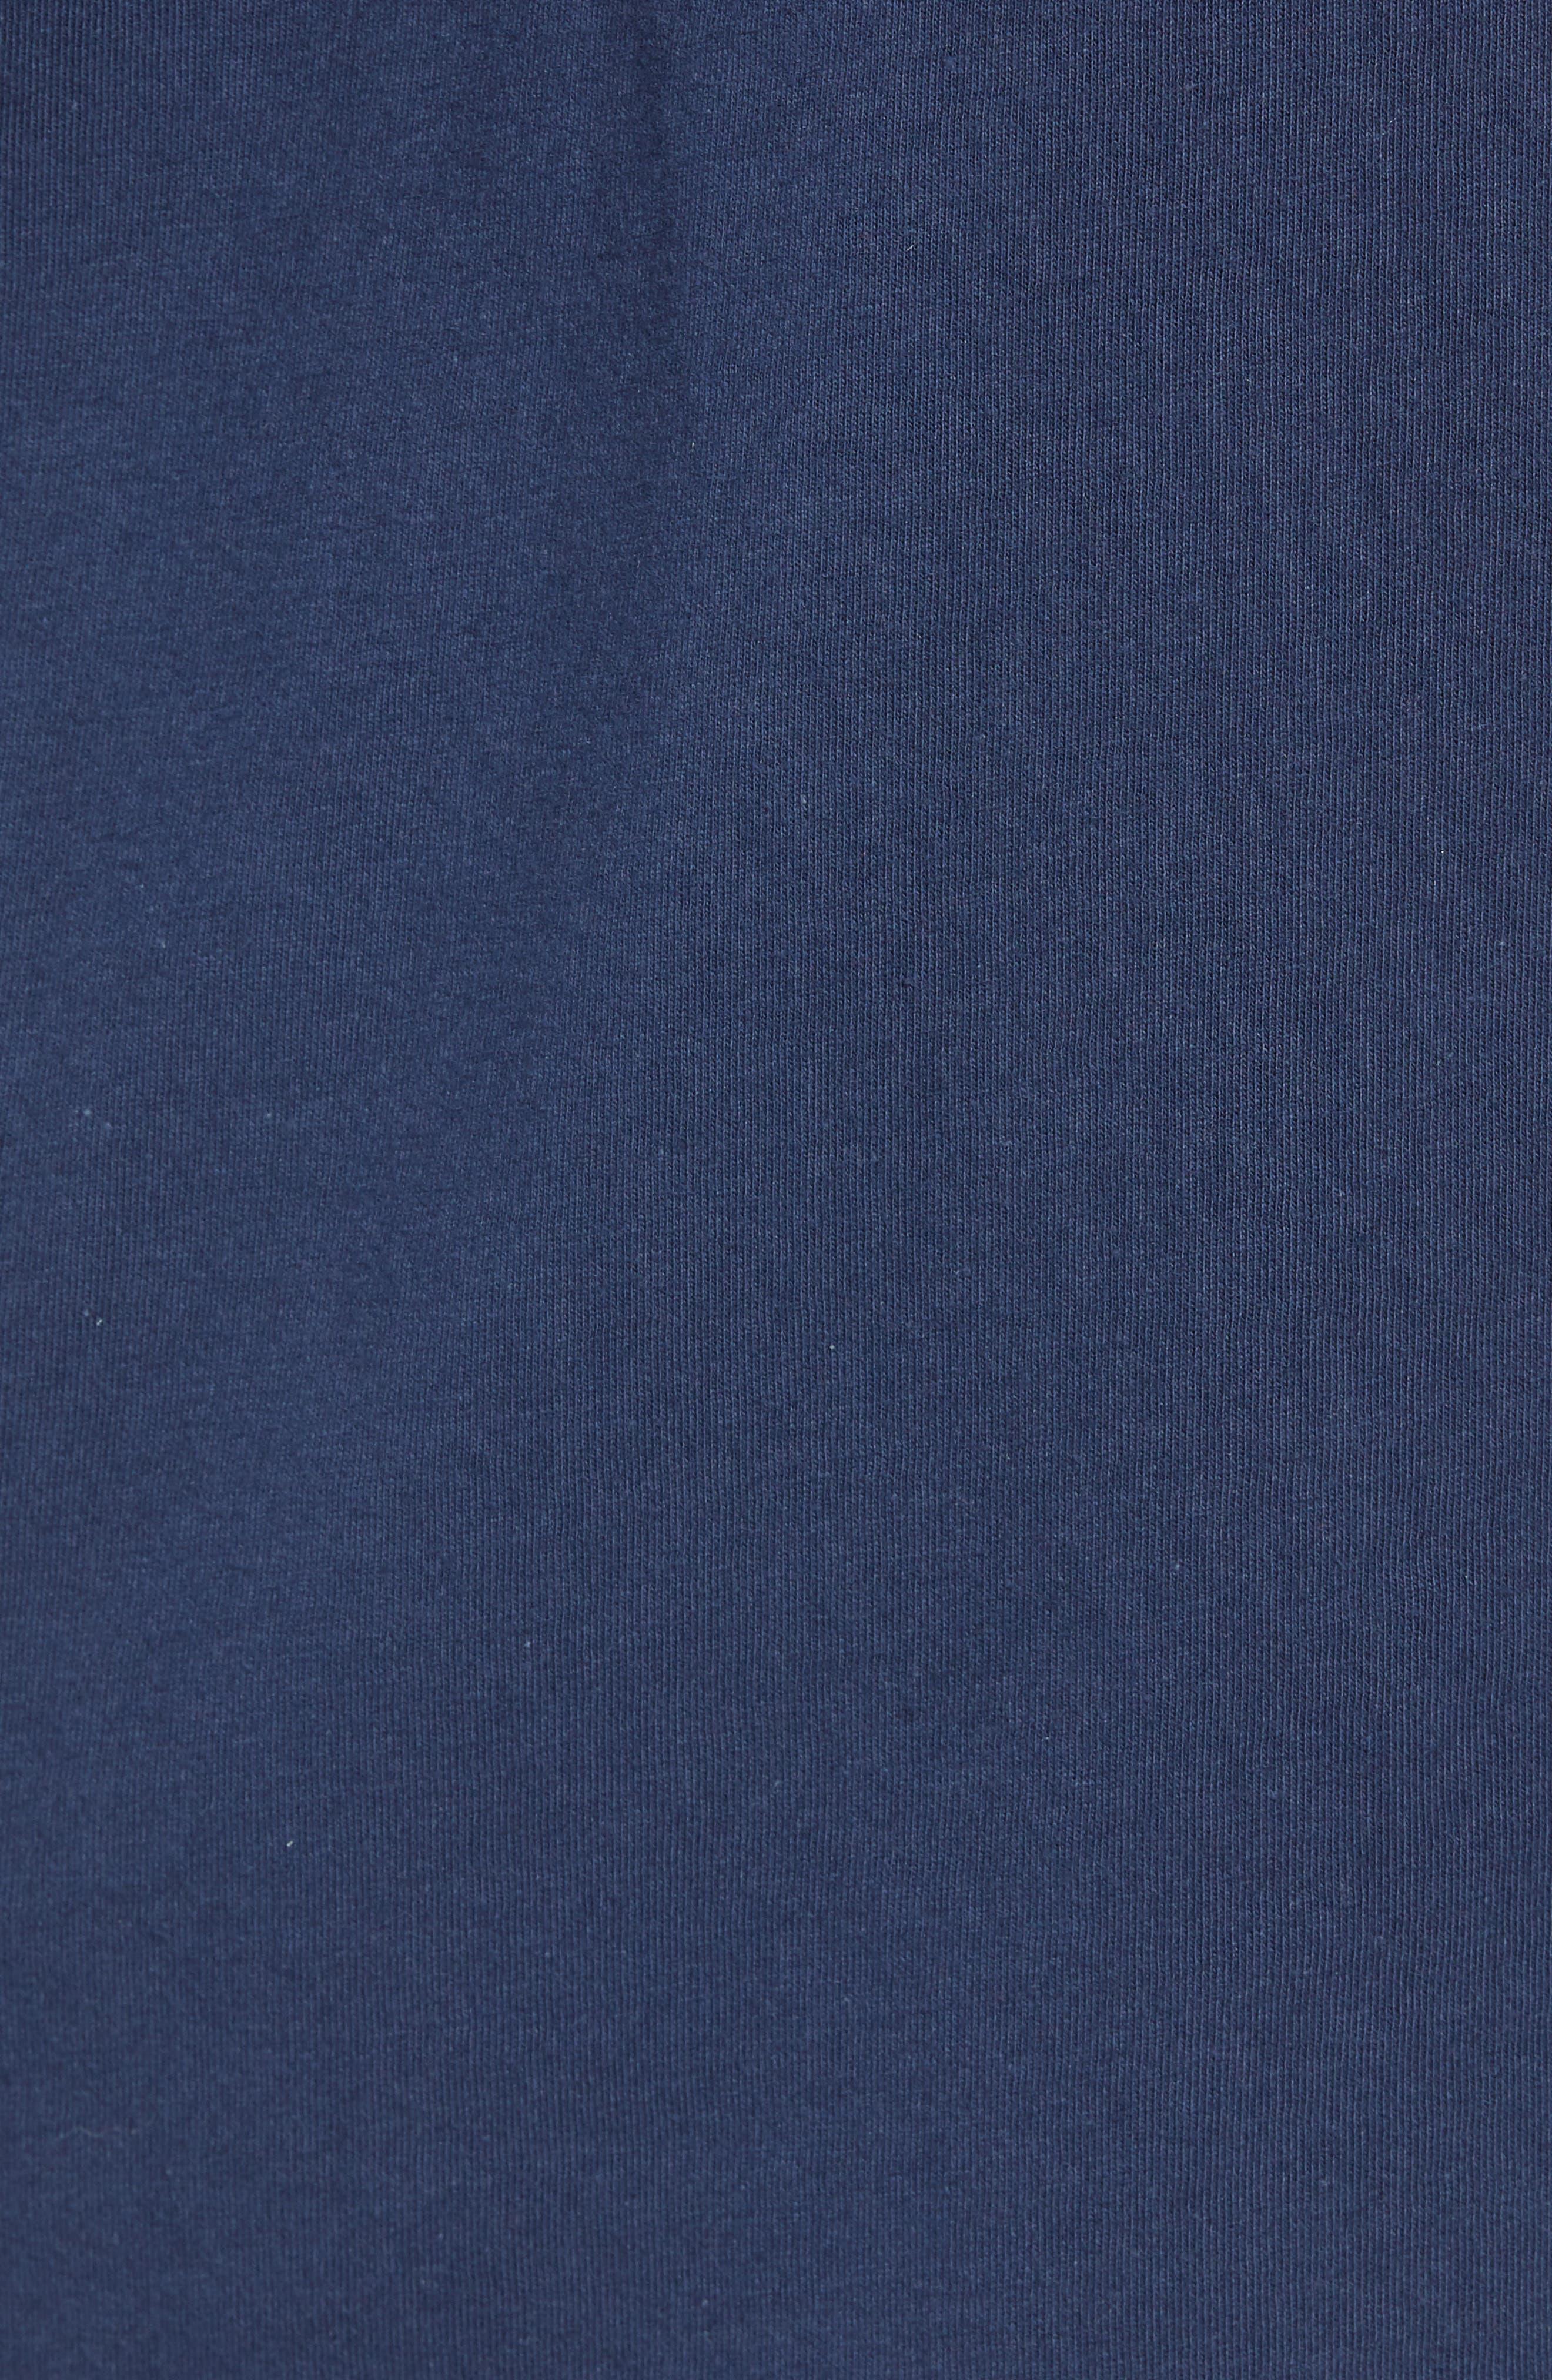 x Marvel<sup>®</sup> Black Panther T-Shirt,                             Alternate thumbnail 5, color,                             401